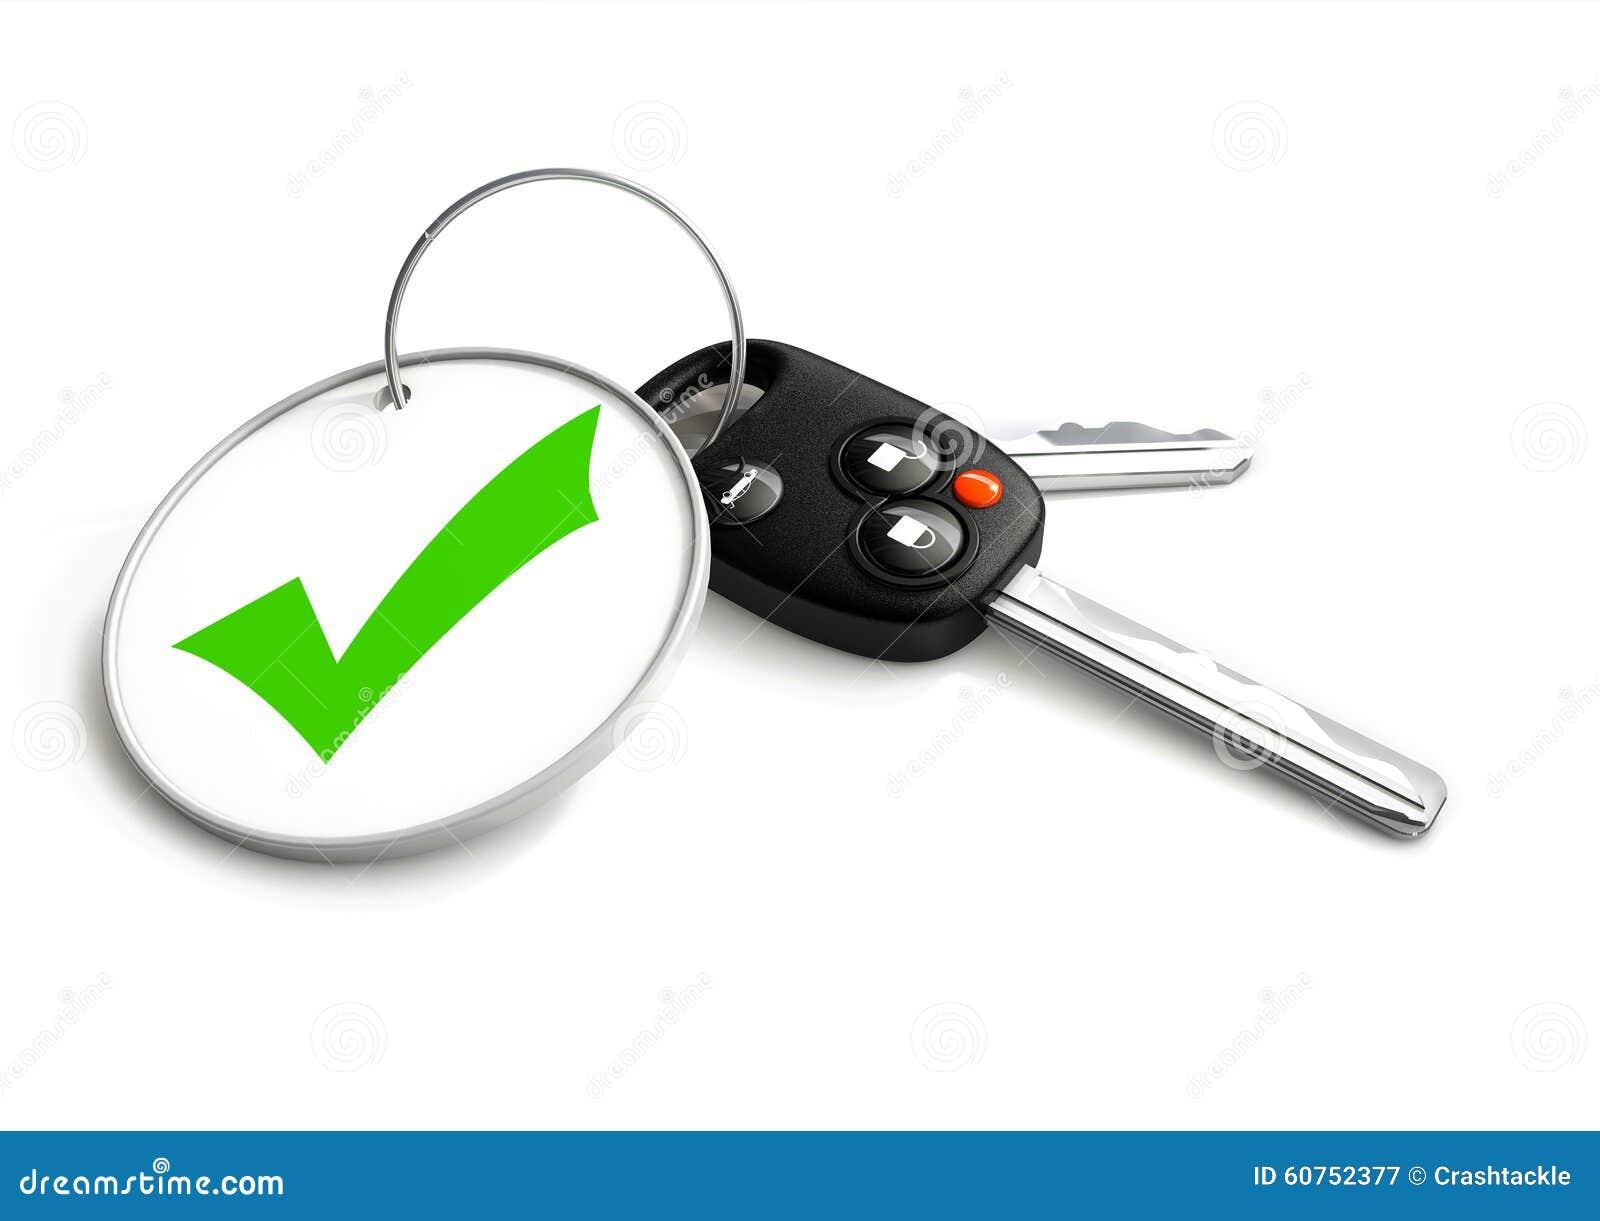 car keys with approved tick symbol on key ring concept for appr stock photo image 60752377. Black Bedroom Furniture Sets. Home Design Ideas